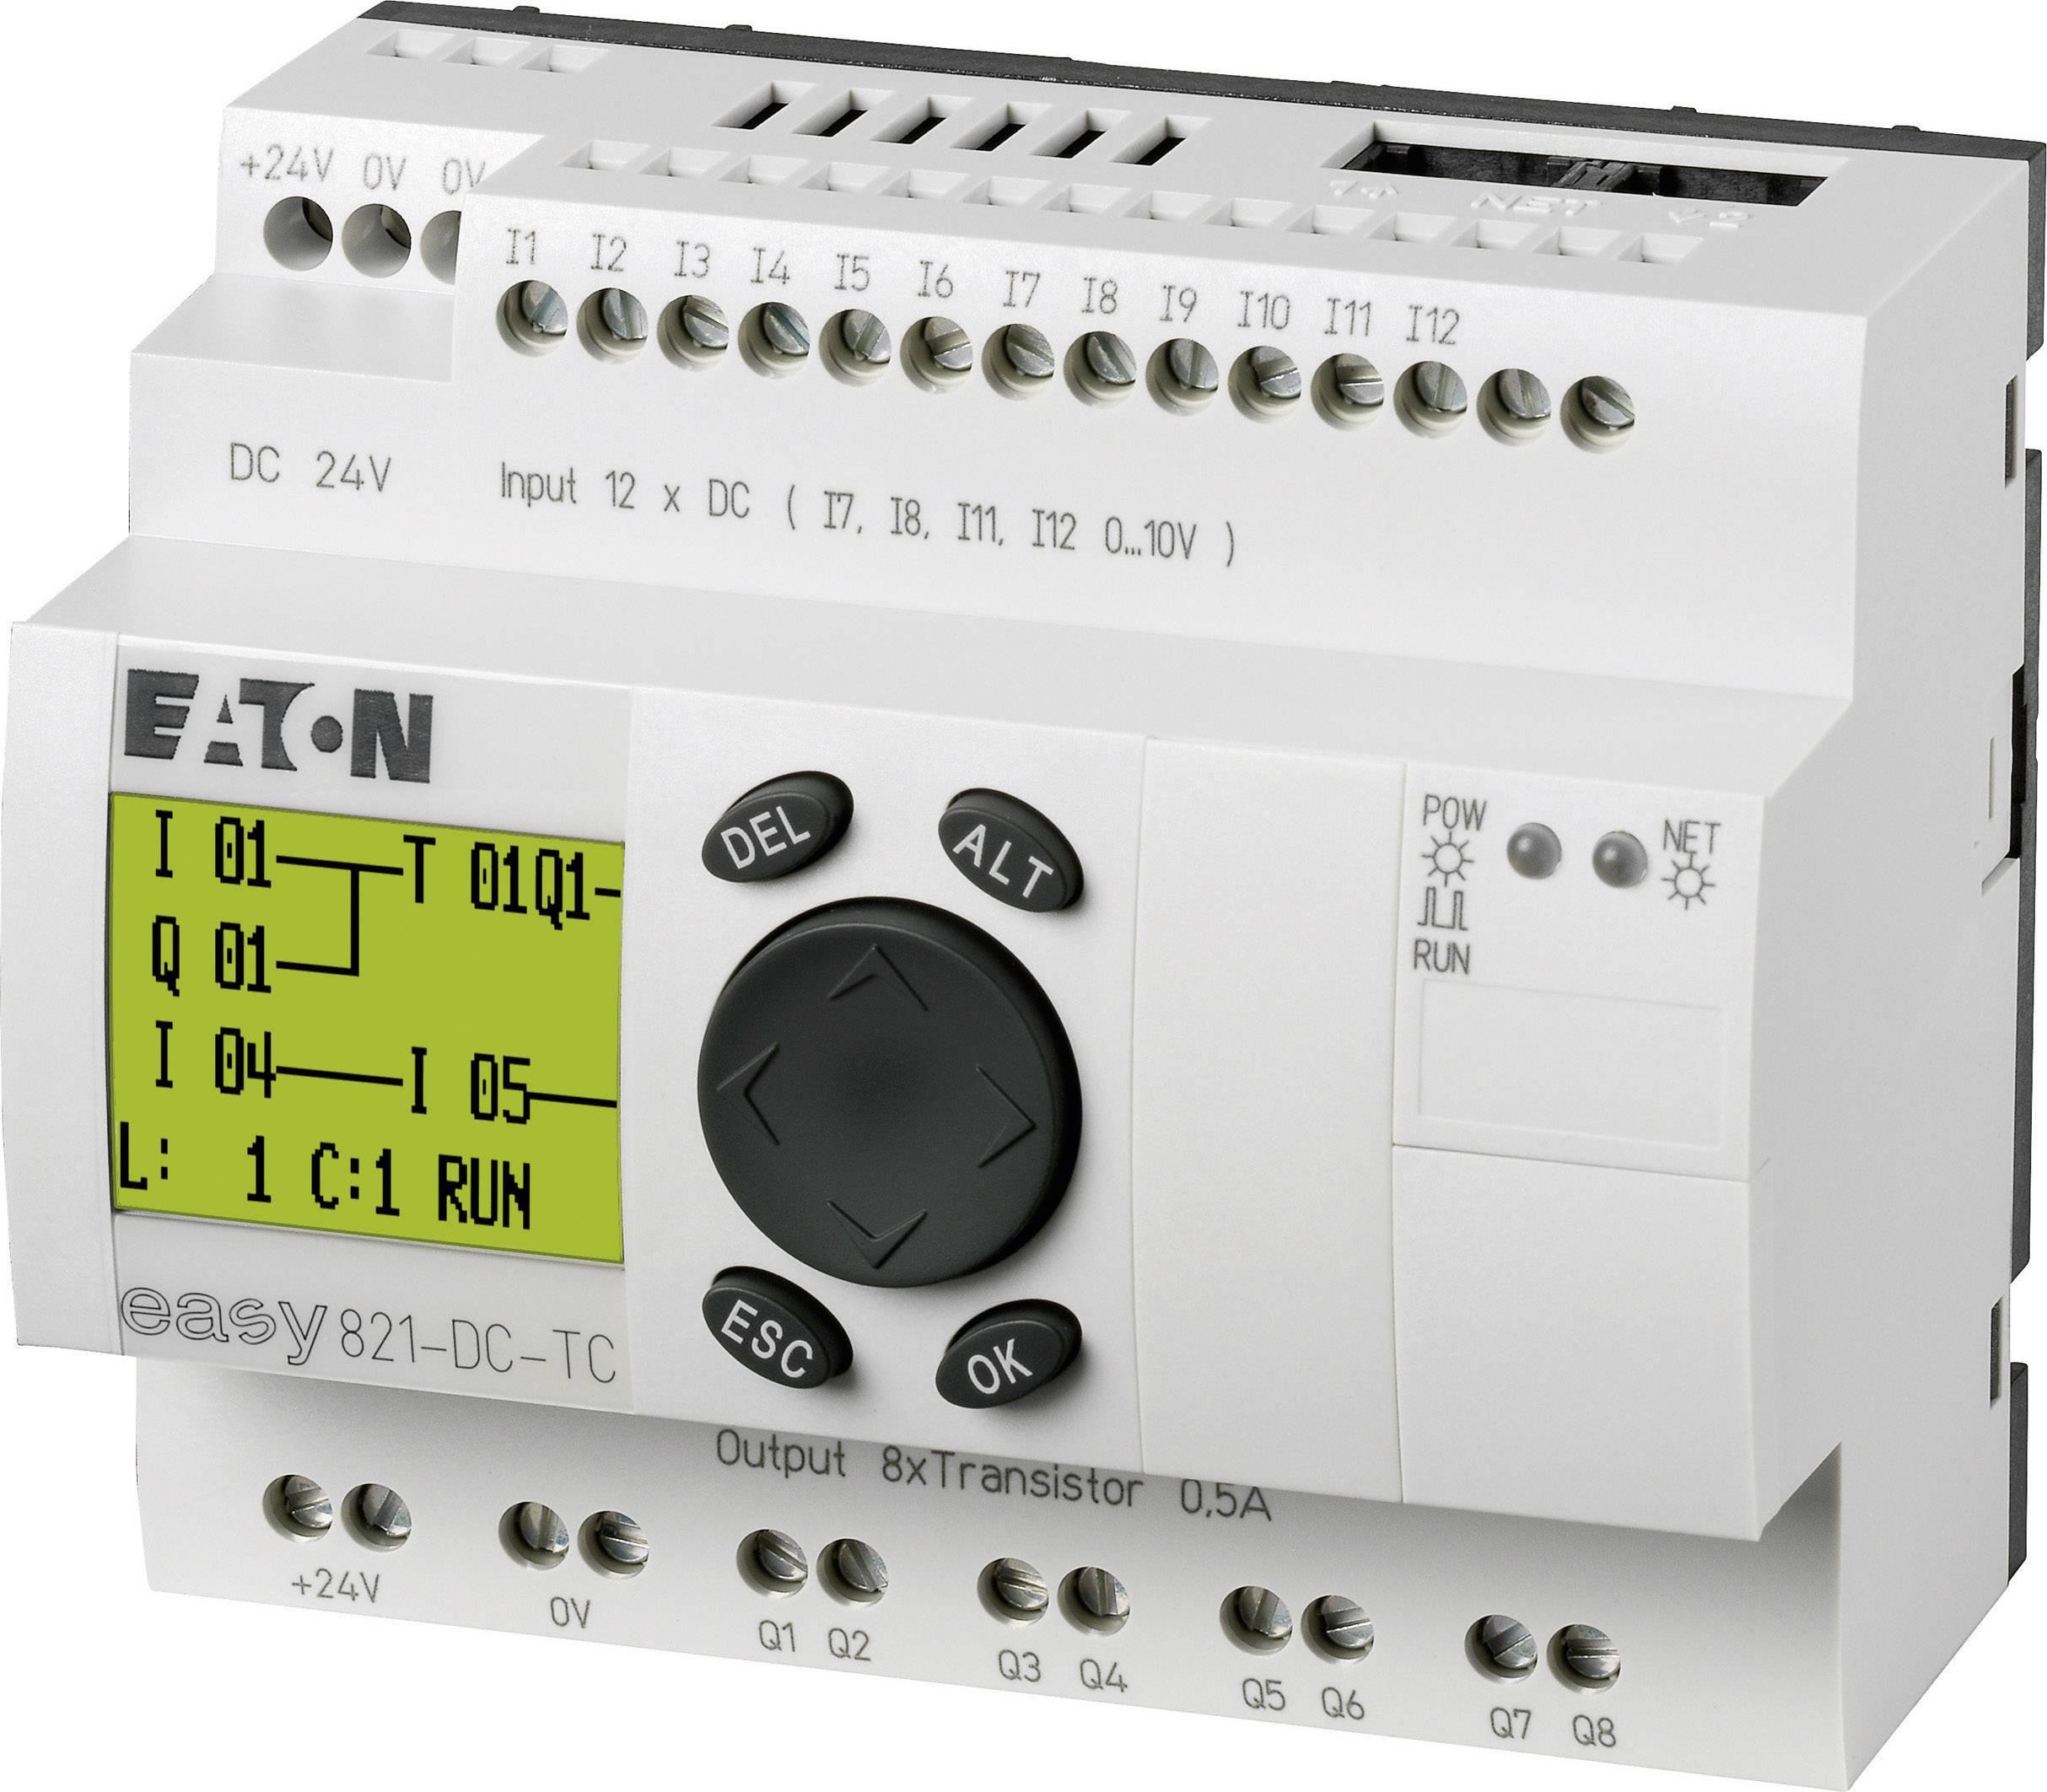 Riadiacimodul Eaton easy 821-DC-TC 256273, 24 V/DC